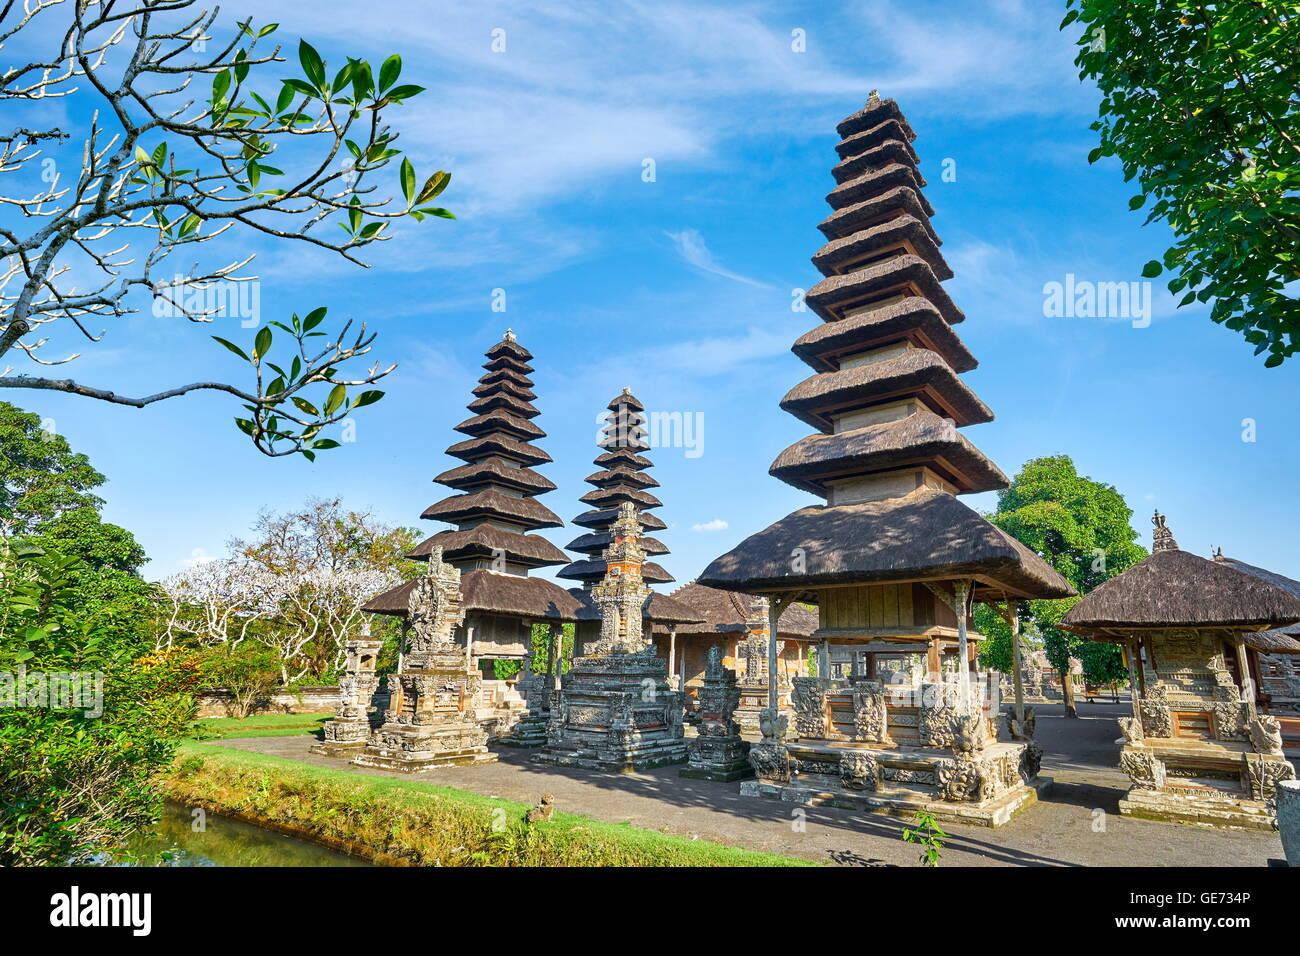 Templo Real de Mengwi, Pura Taman Ayun, Templo, Bali, Indonesia Imagen De Stock